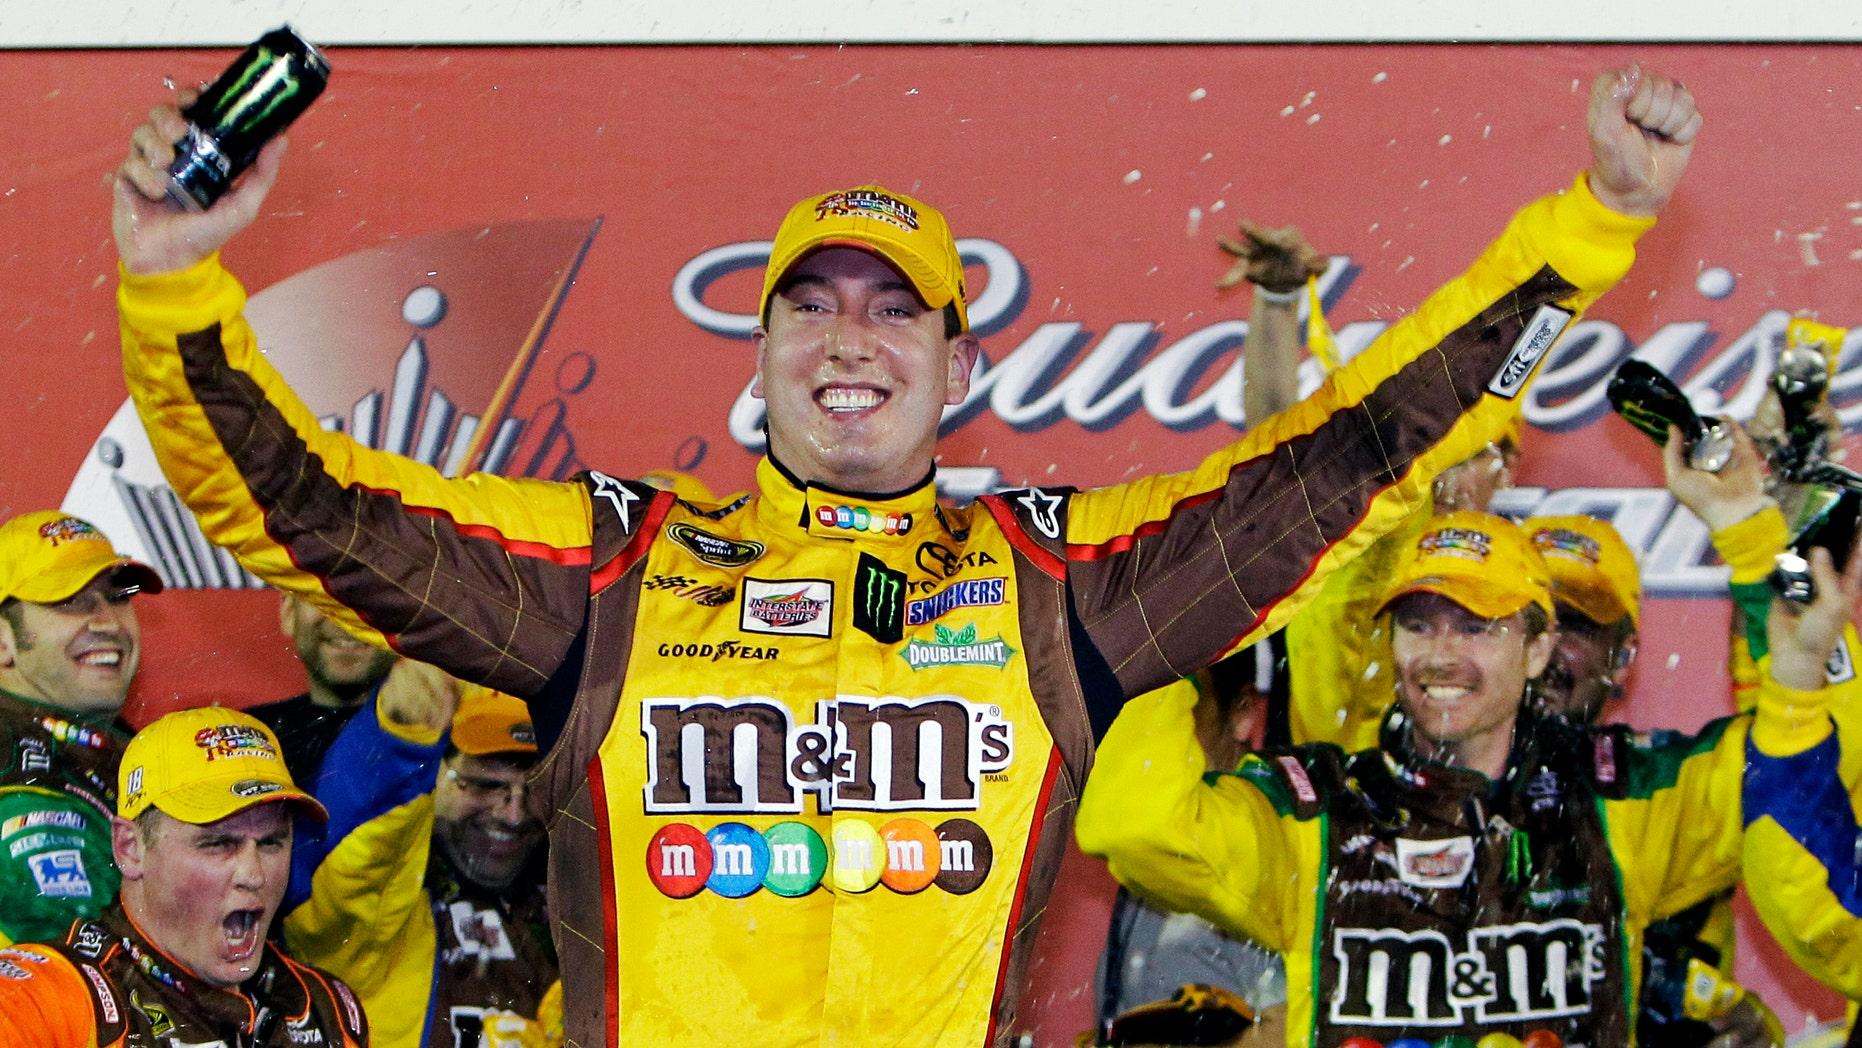 Kyle Busch celebrates in victory lane after winning the NASCAR Budweiser Shootout auto race at Daytona International Speedway on Saturday in Daytona Beach. (AP Photo/John Raoux)